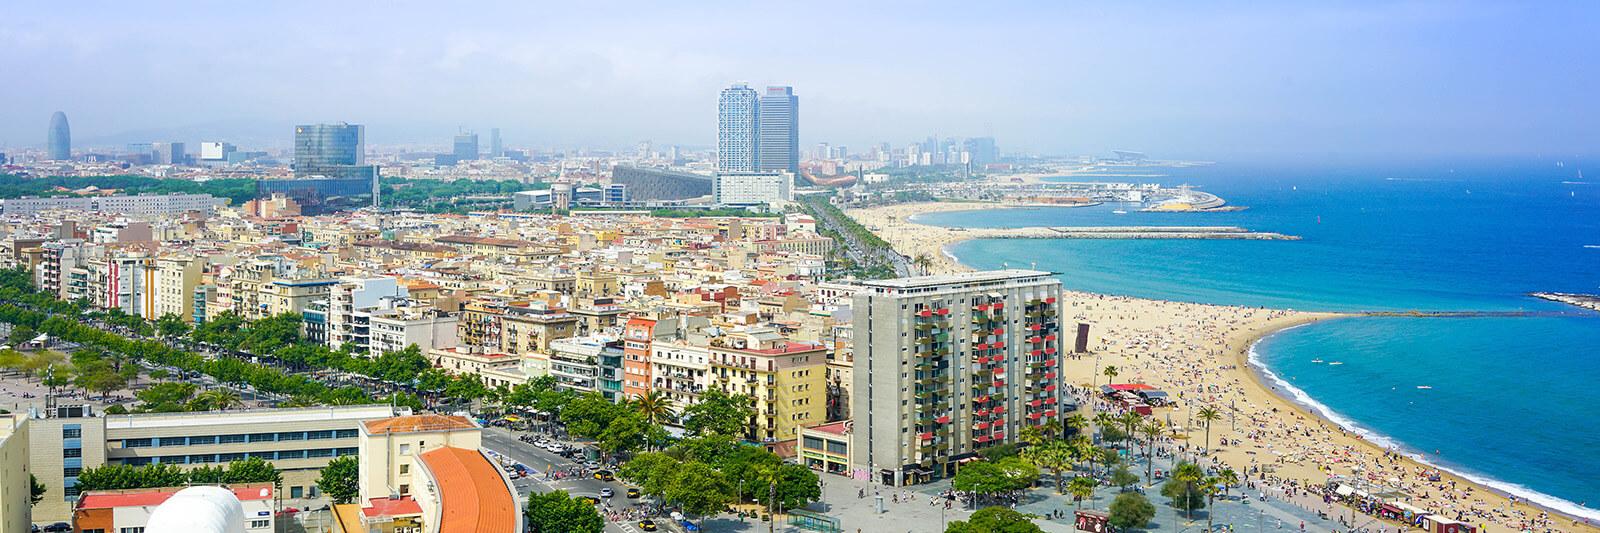 Breathtaking aerial view of Barcelona, Spain